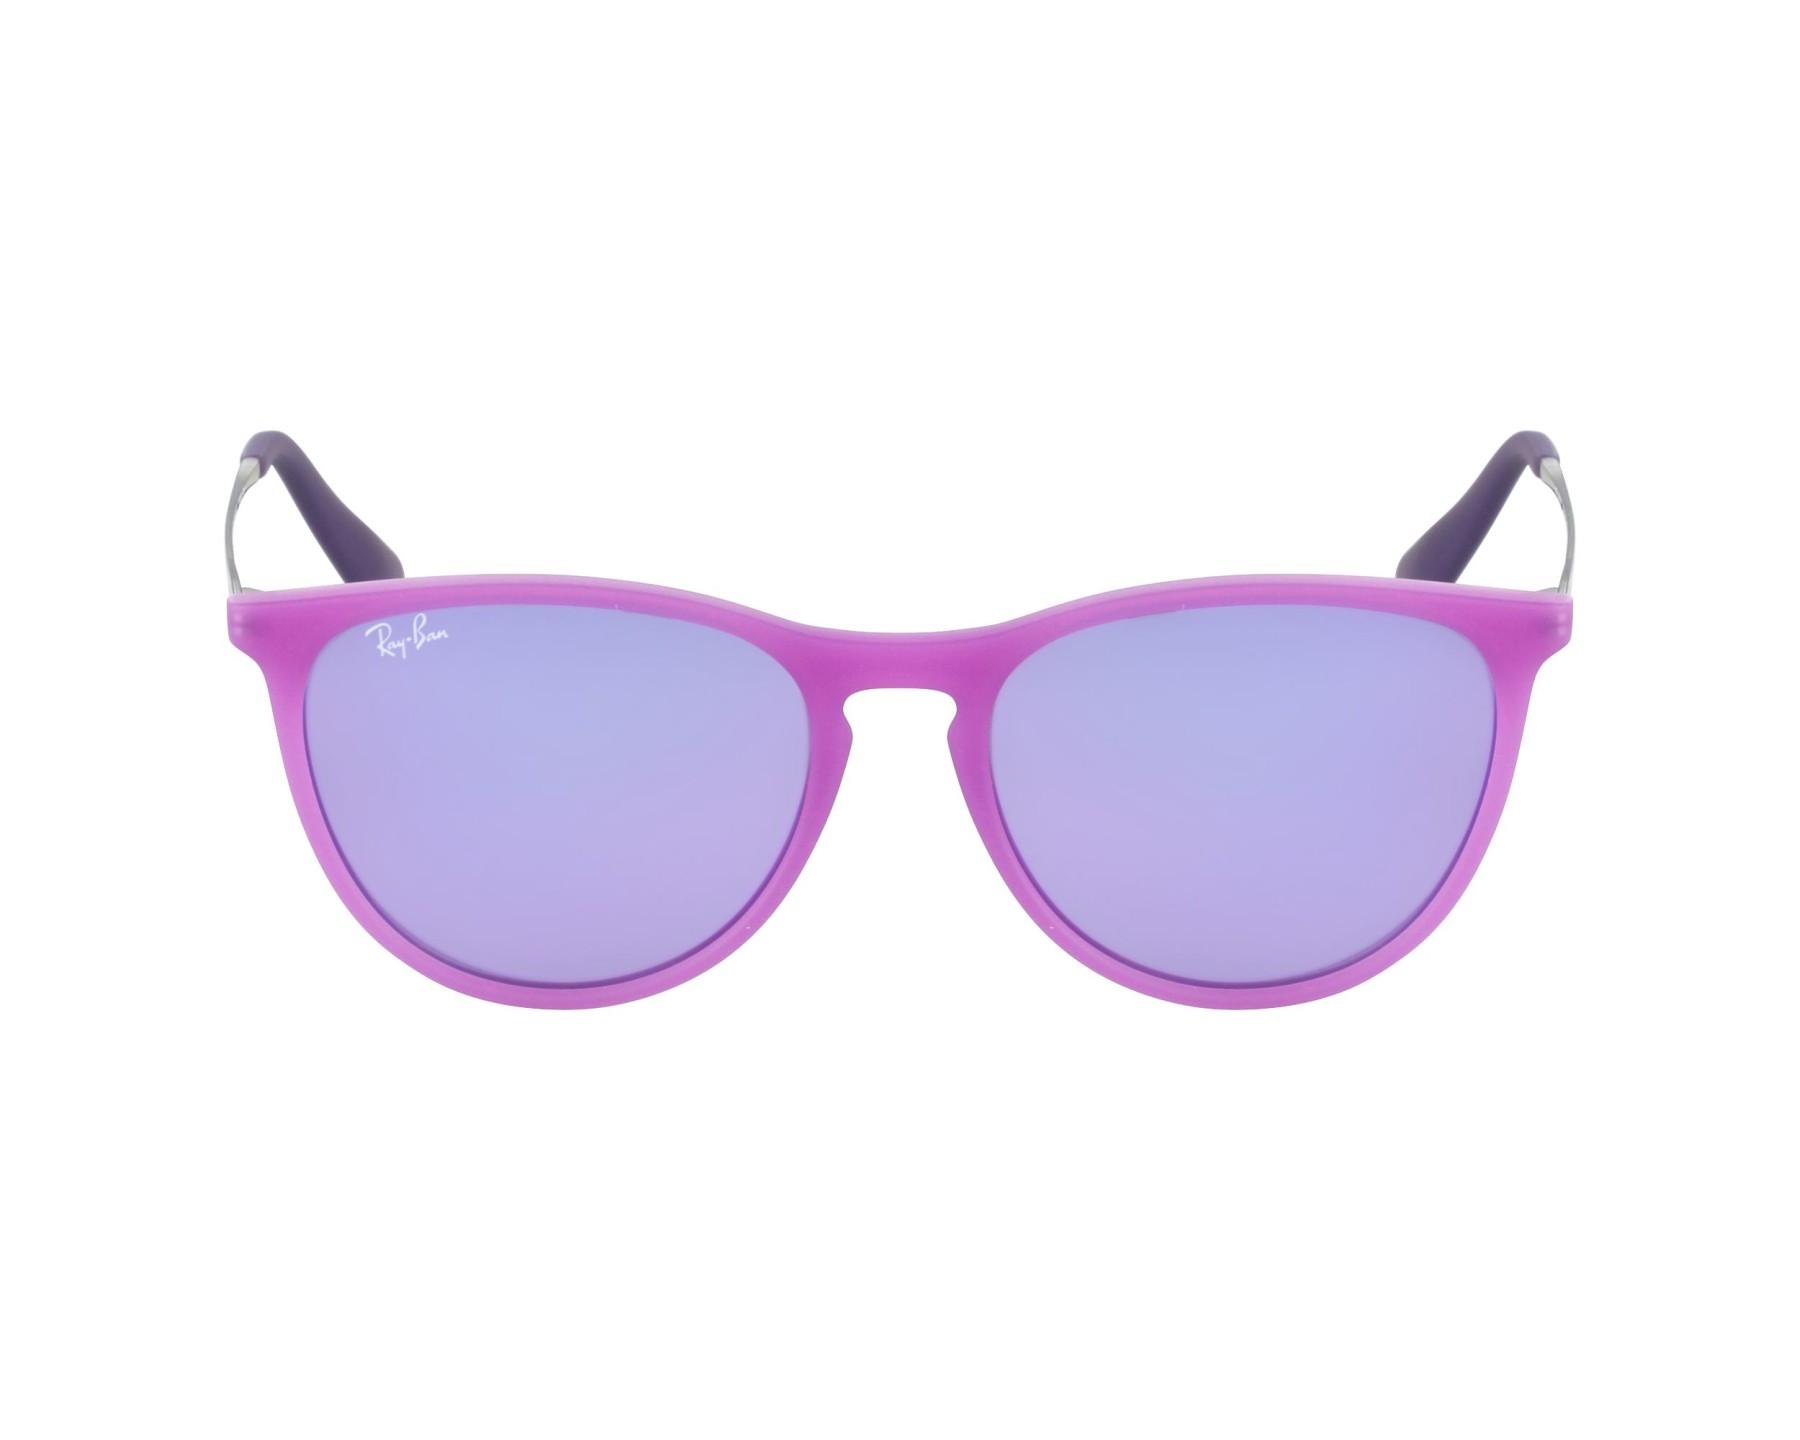 872e89dbc11 thumbnail Sunglasses Ray-Ban RJ-9060-S 70084V - Purple Silver profile view